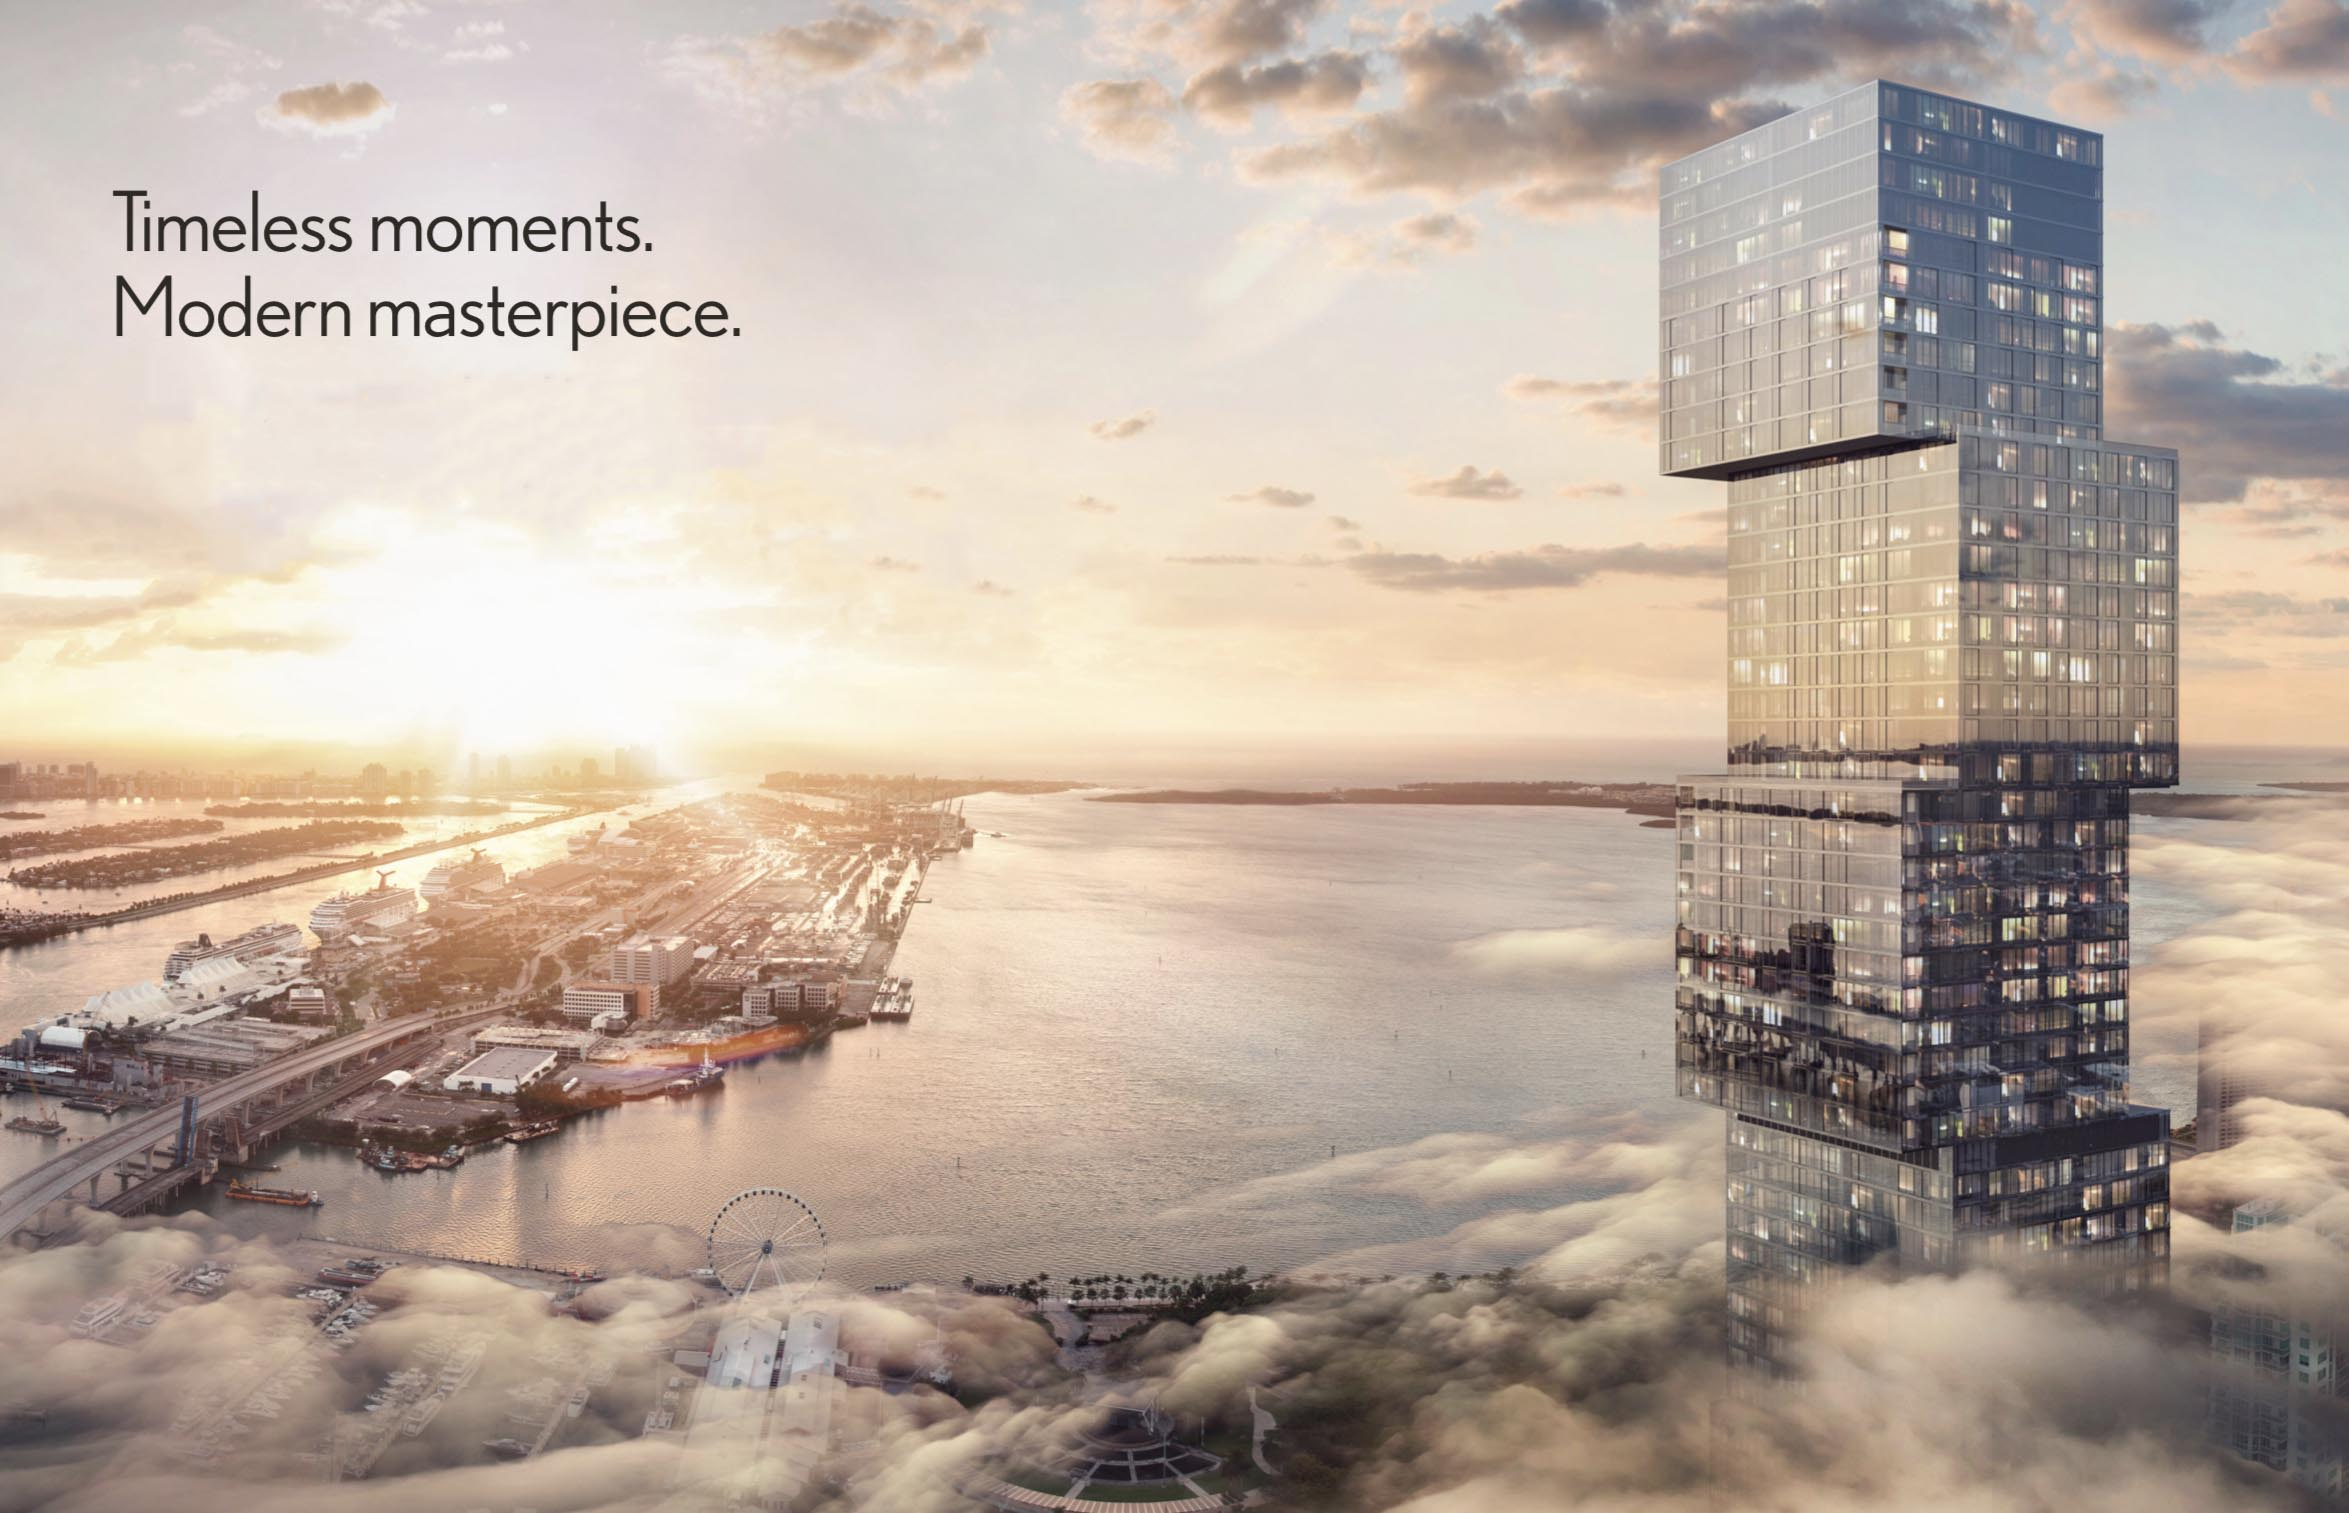 waldorf-astoria-miami-residences-condos-preconstrucion-florida-condo